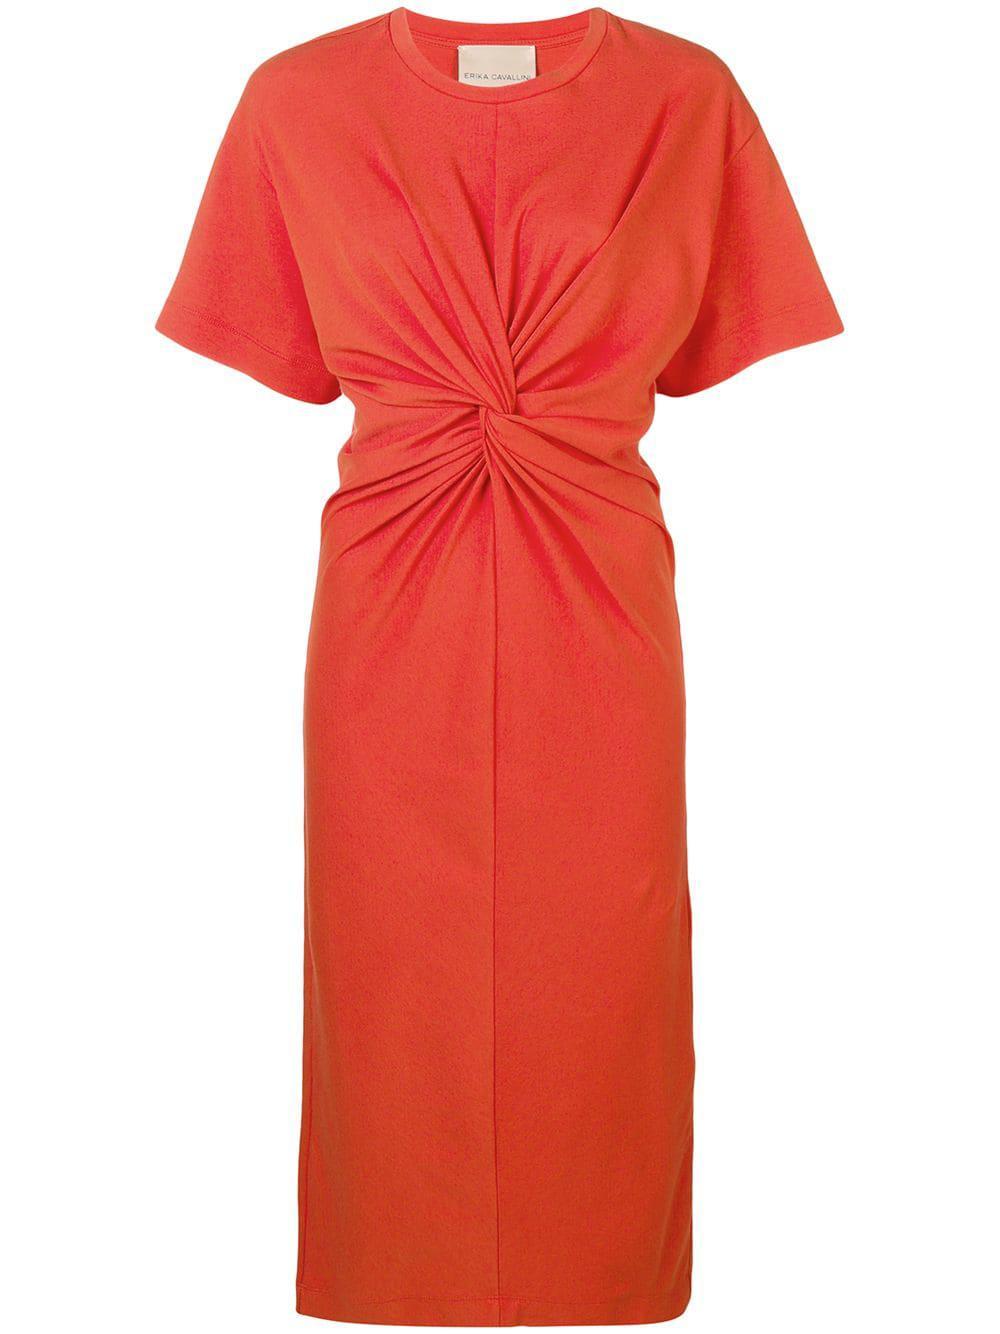 5148b9927c5b Erika Cavallini Semi Couture Dafne Cotton Dress in Orange - Save 1 ...